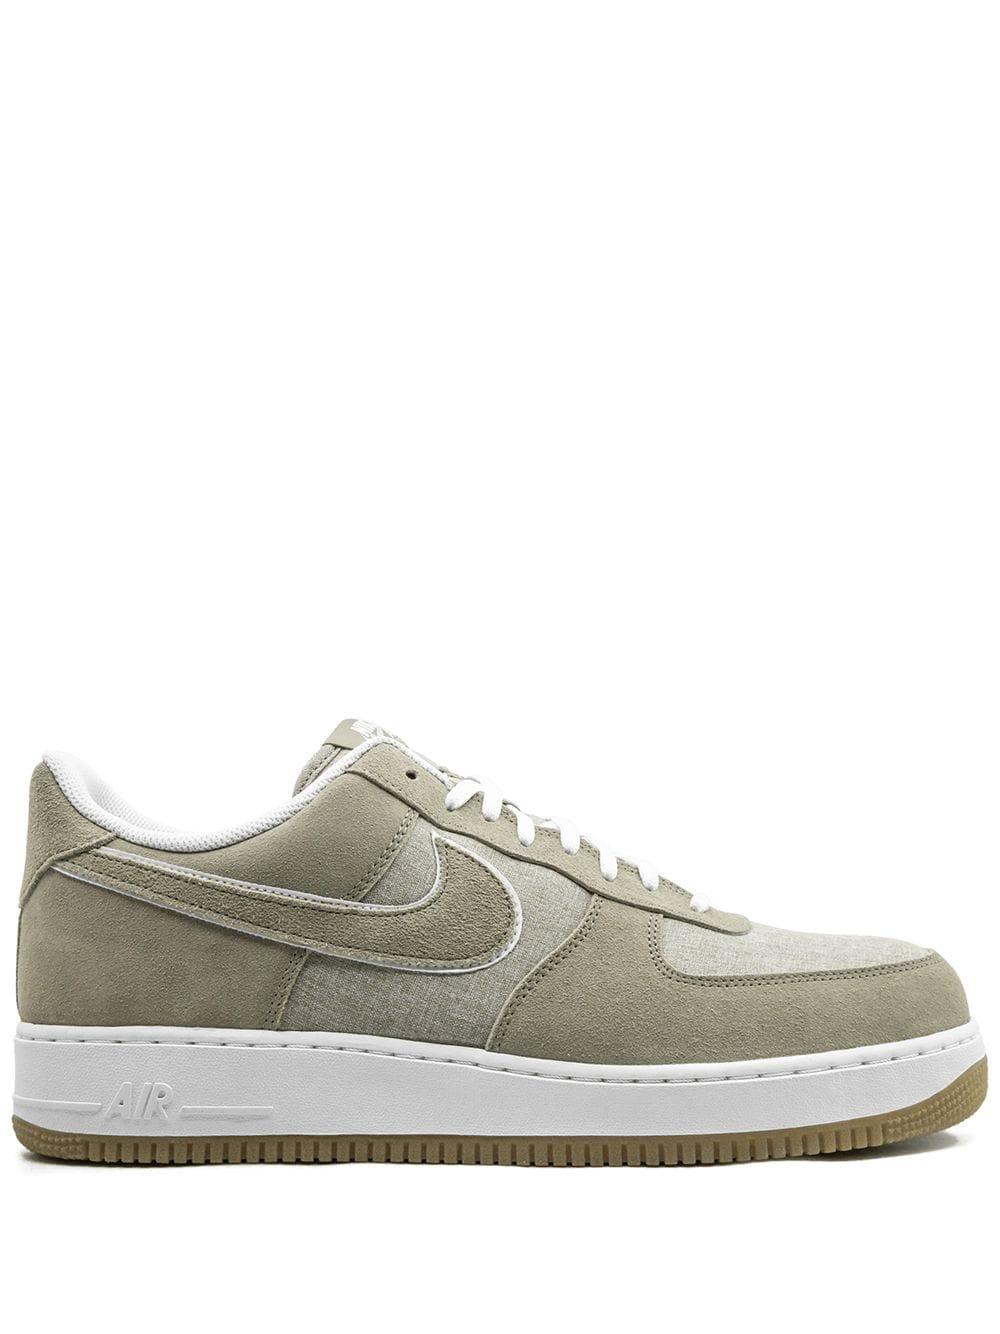 Nike Air Force 1 07 Sneakers Grun In Green Nike Air Force Nike Air White Air Force 1